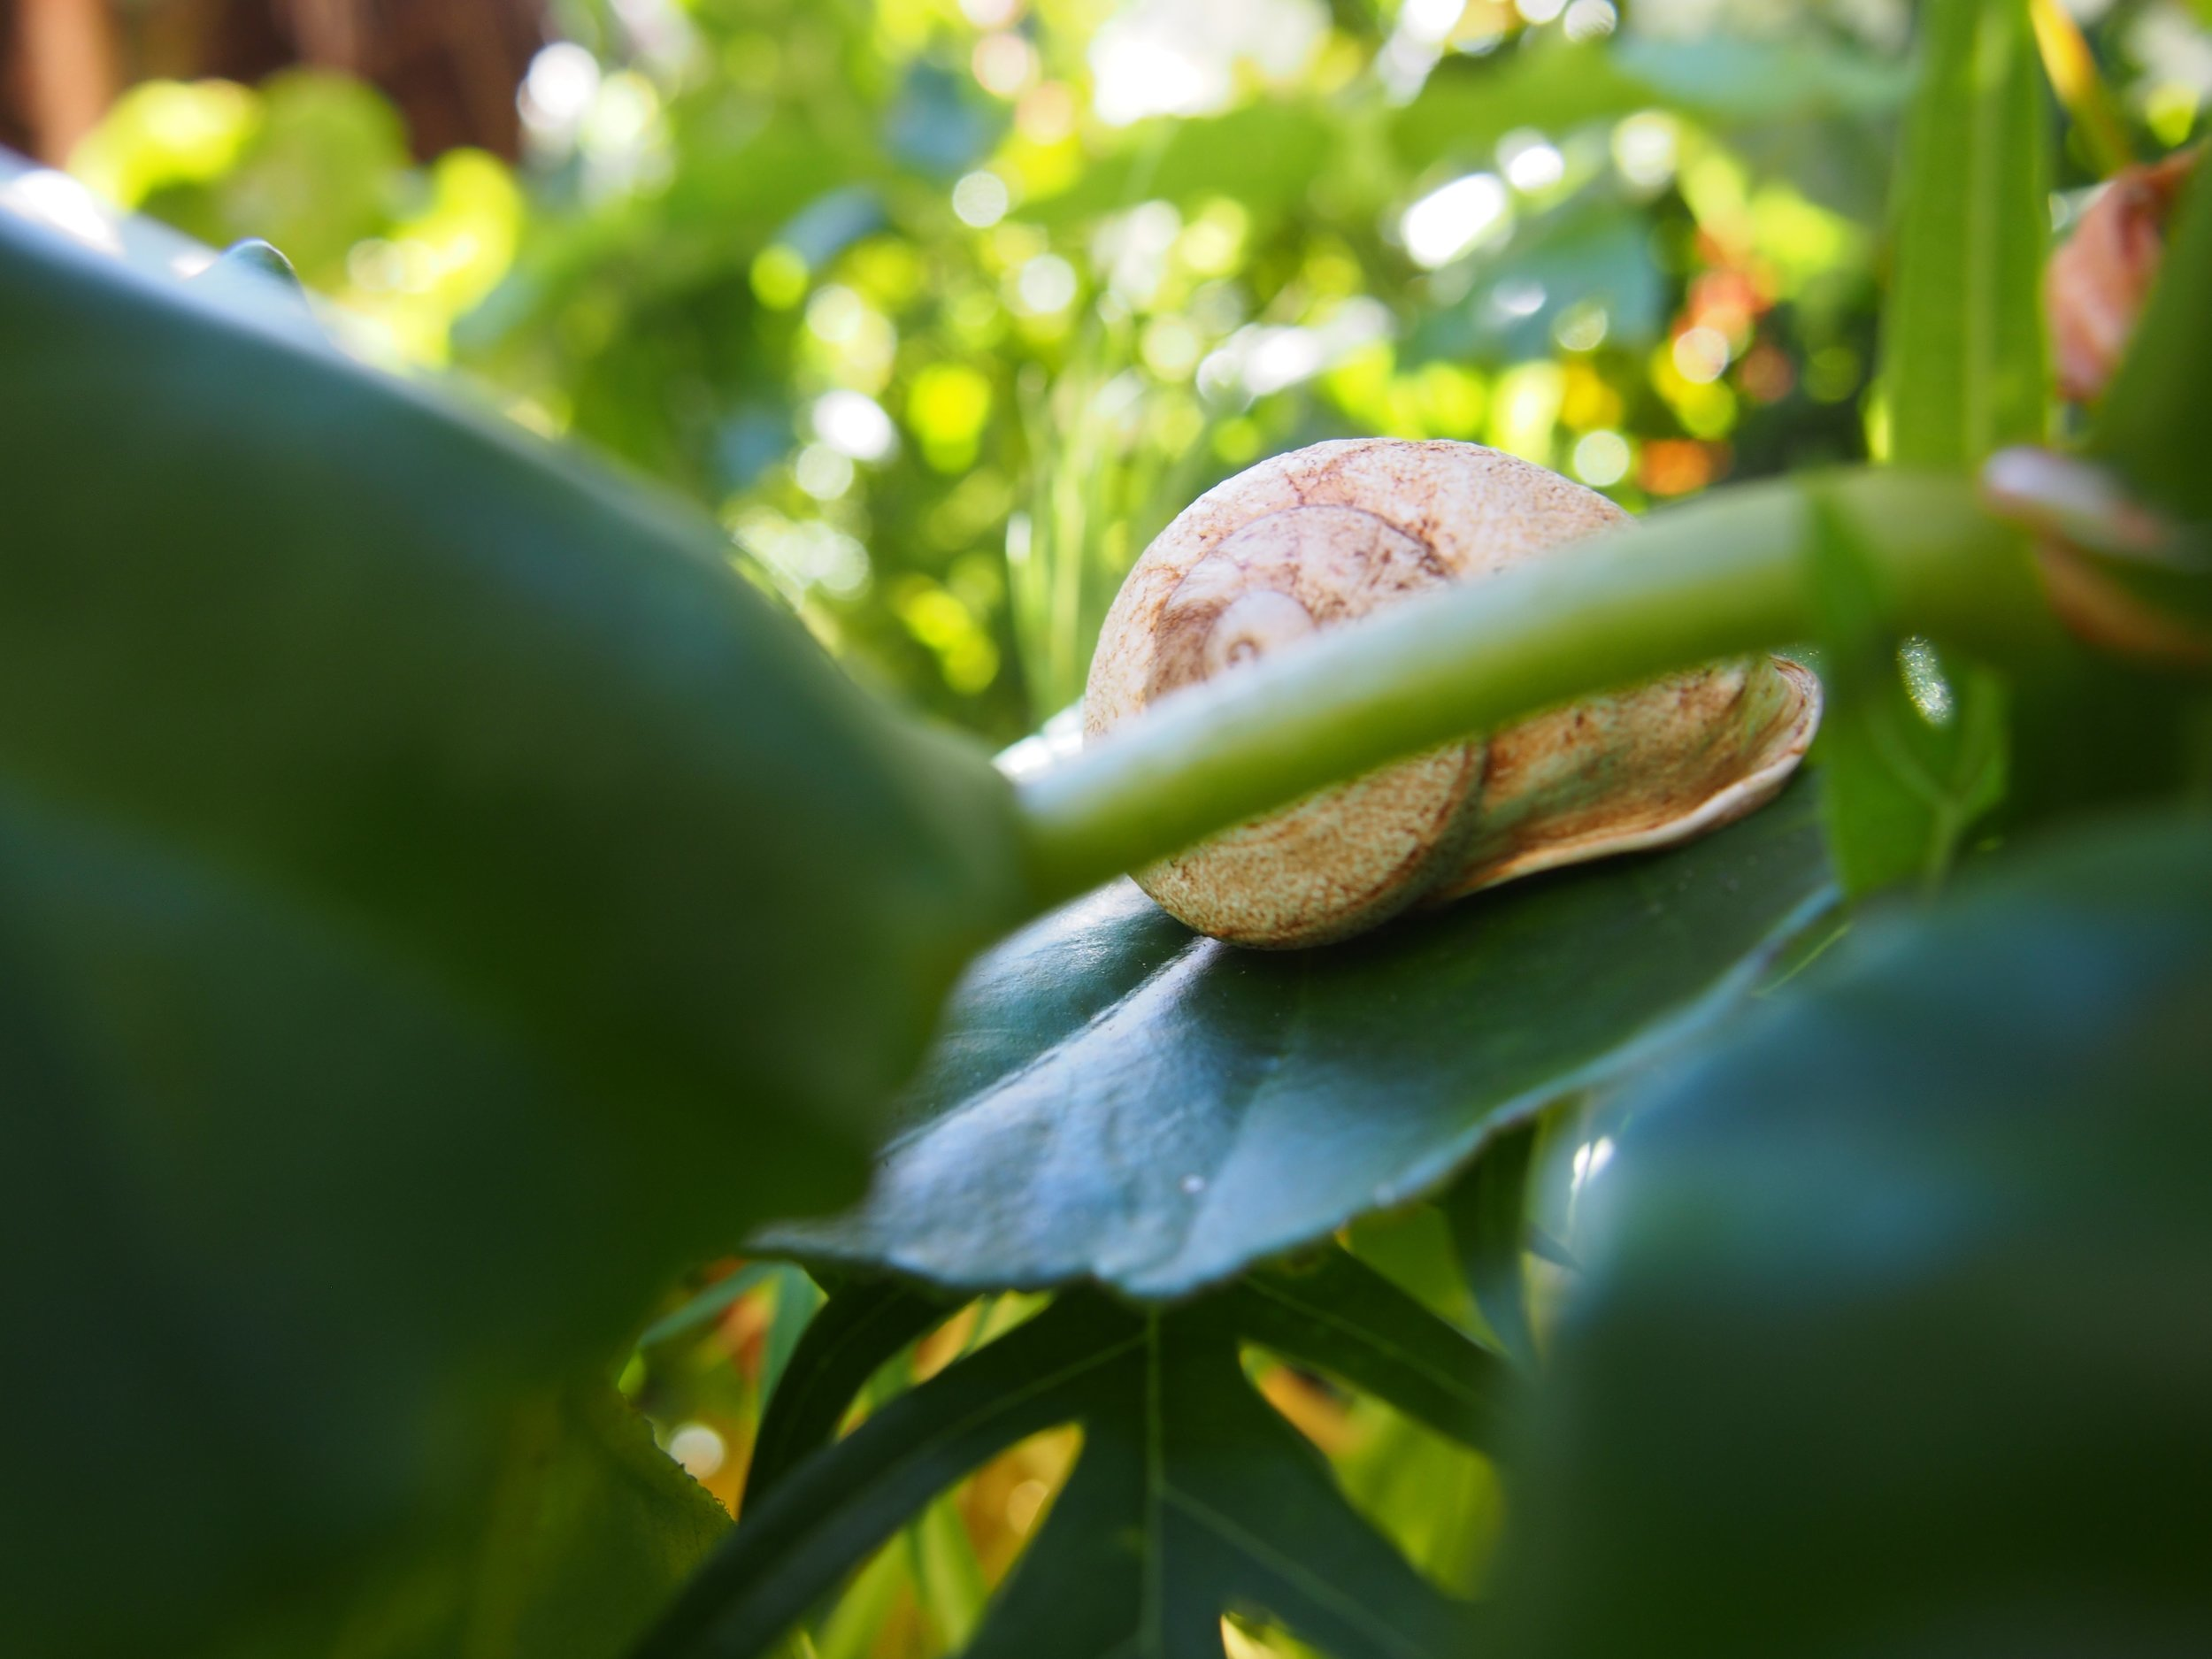 A snail's journey across a leaf.